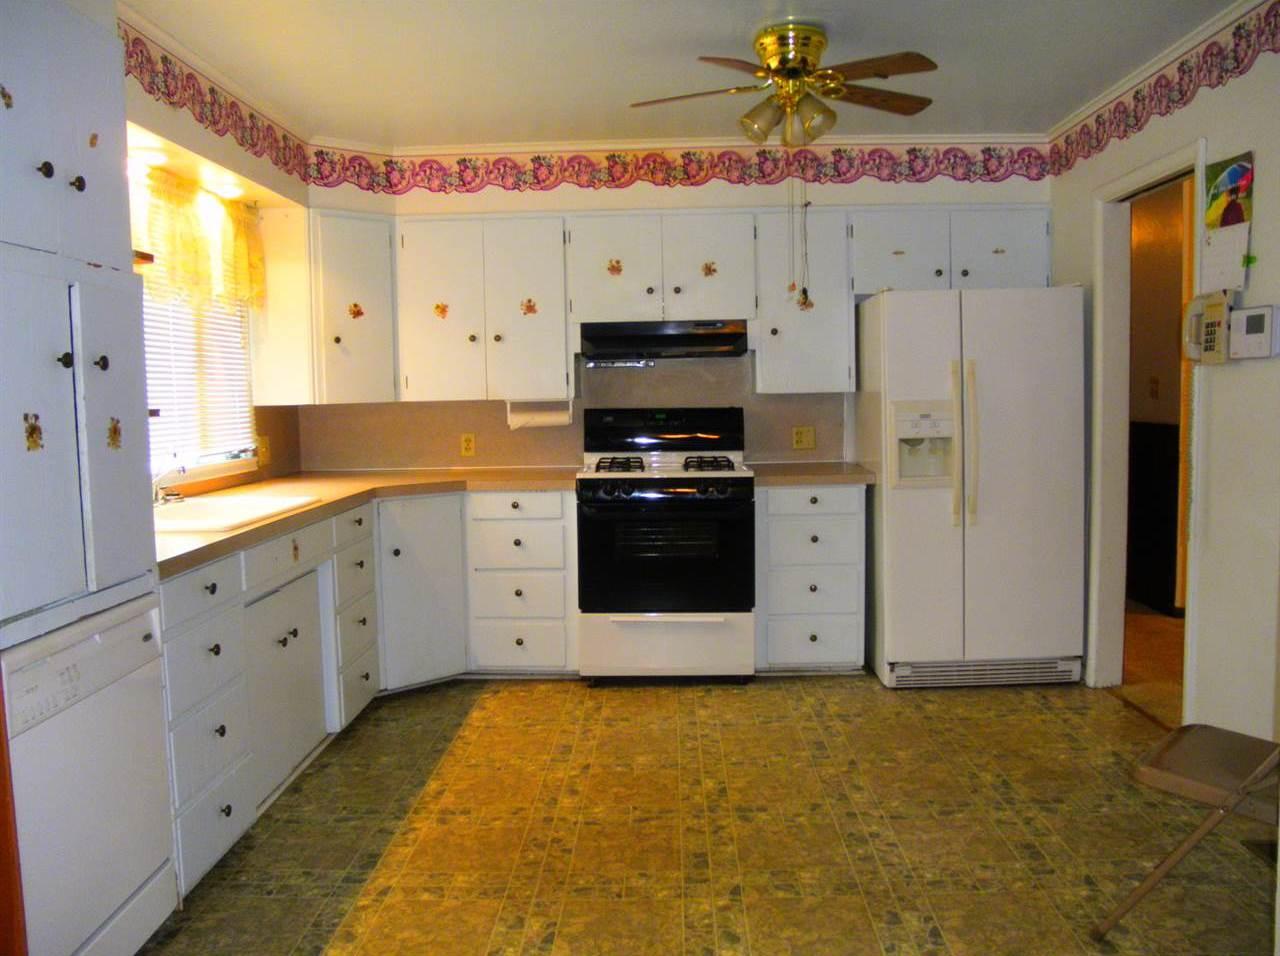 Sold Cross Sale W/ MLS | 1601 Blackard Ponca City, OK 74604 4